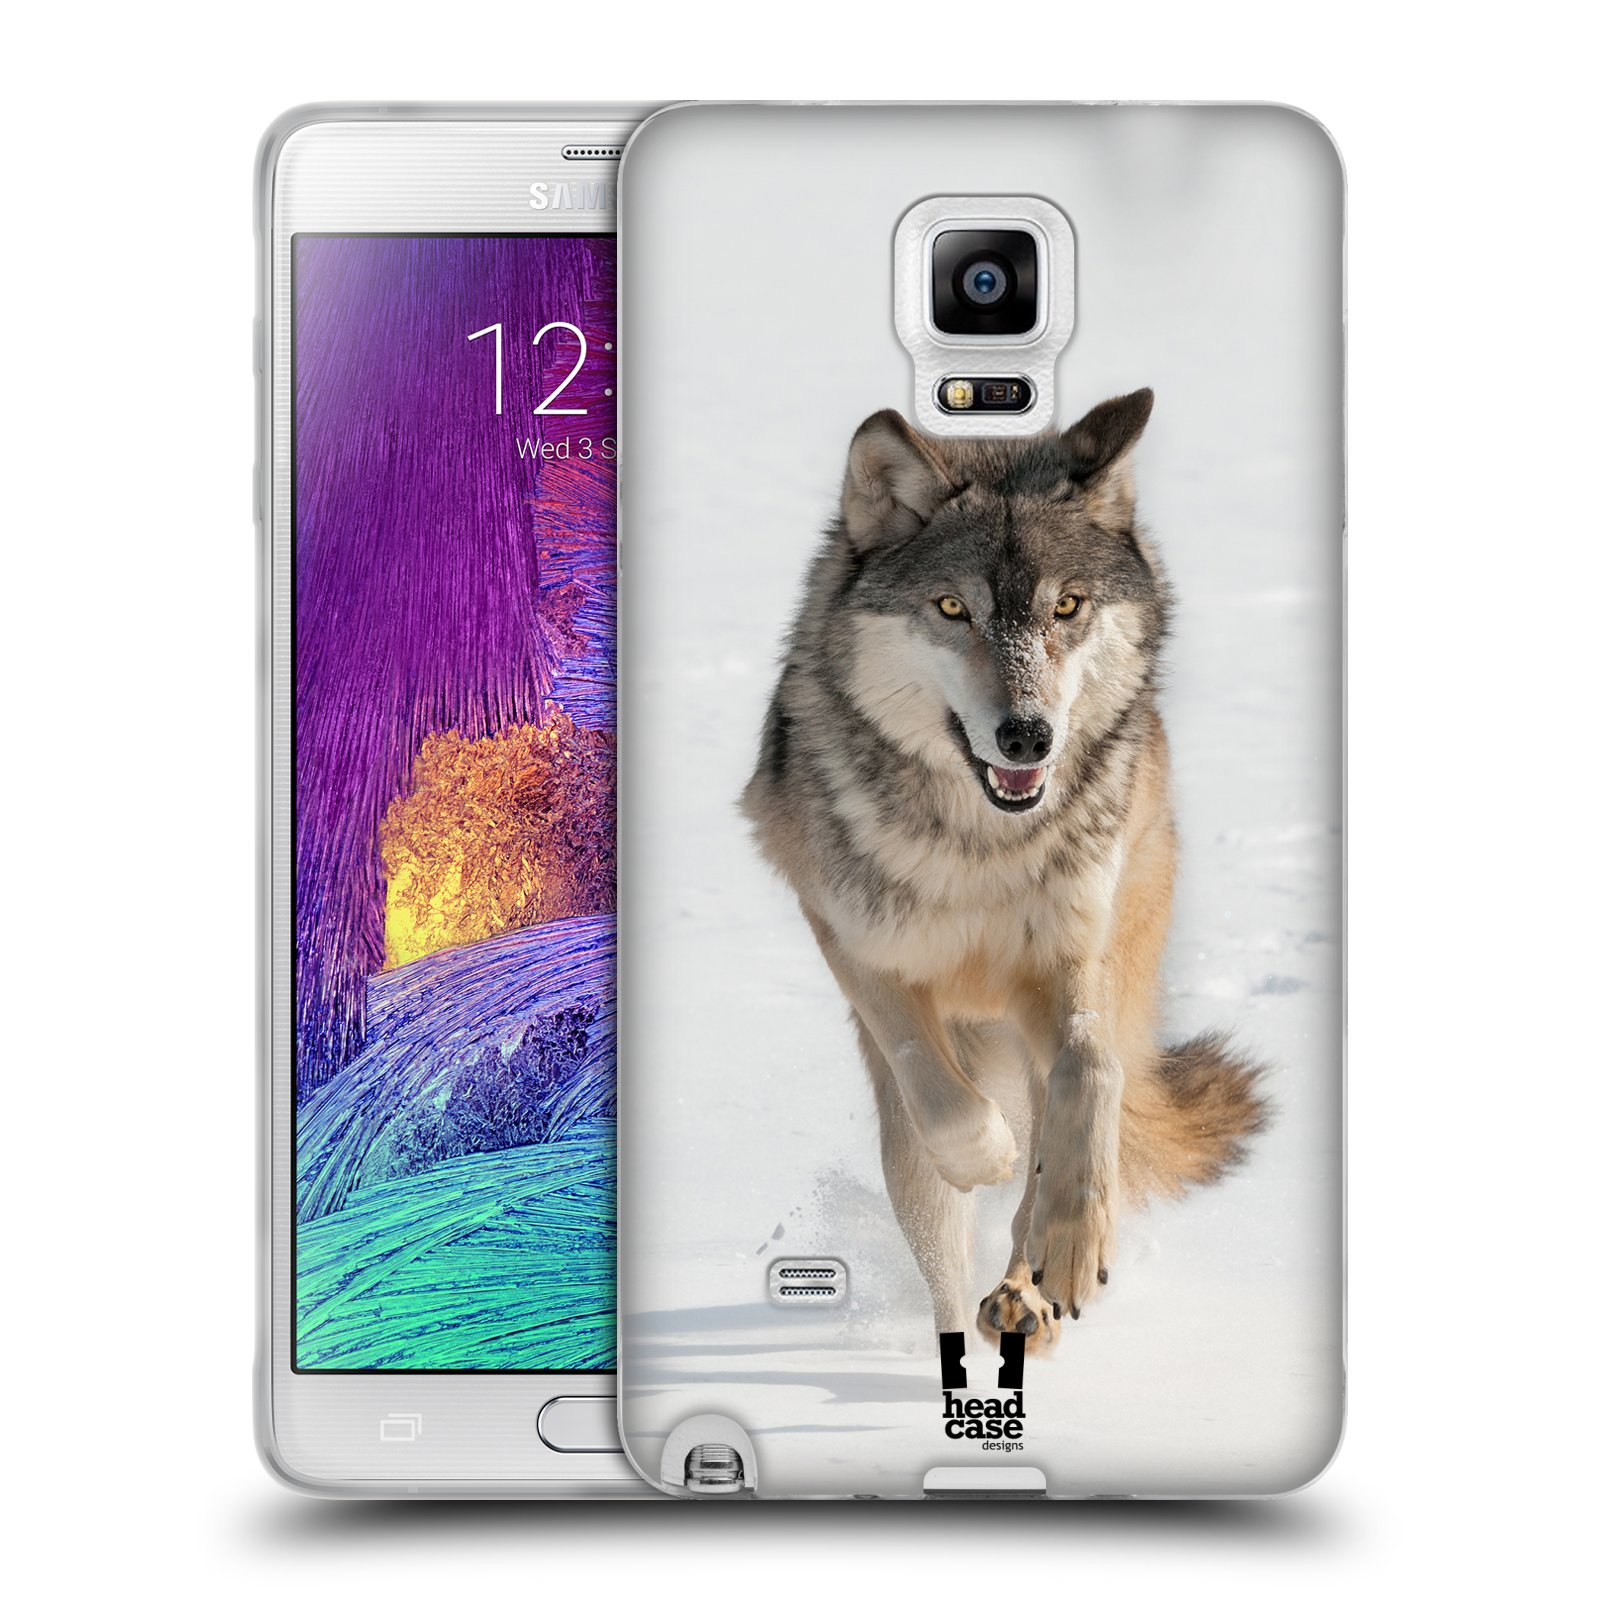 HEAD CASE silikonový obal na mobil Samsung Galaxy Note 4 (N910) vzor Divočina, Divoký život a zvířata foto BĚŽÍCÍ VLK